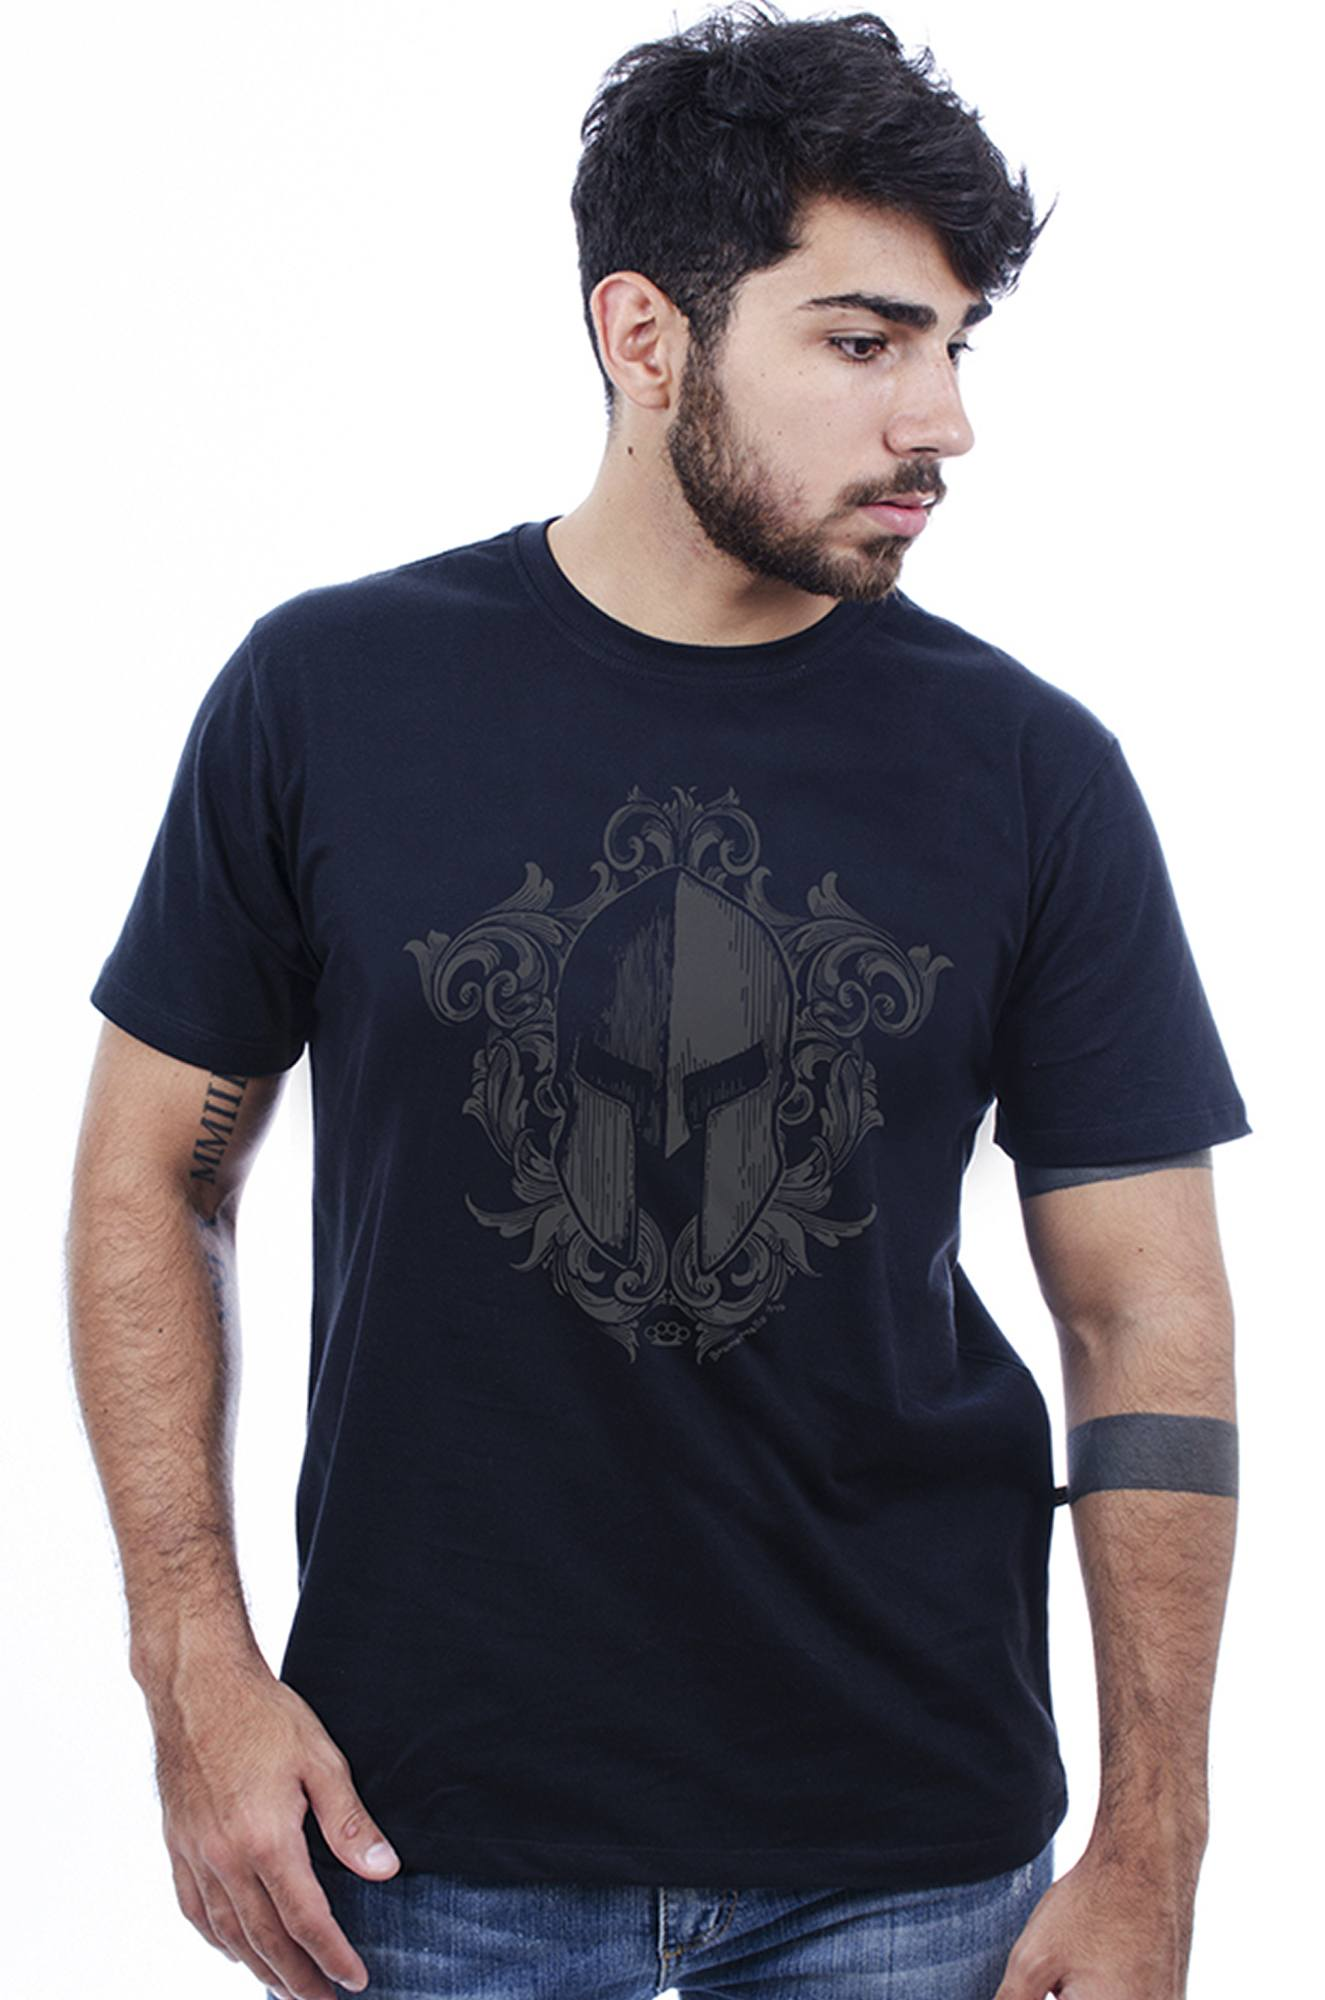 Camiseta Masculina Estampada Elmo Corrosão Preto Hardivision